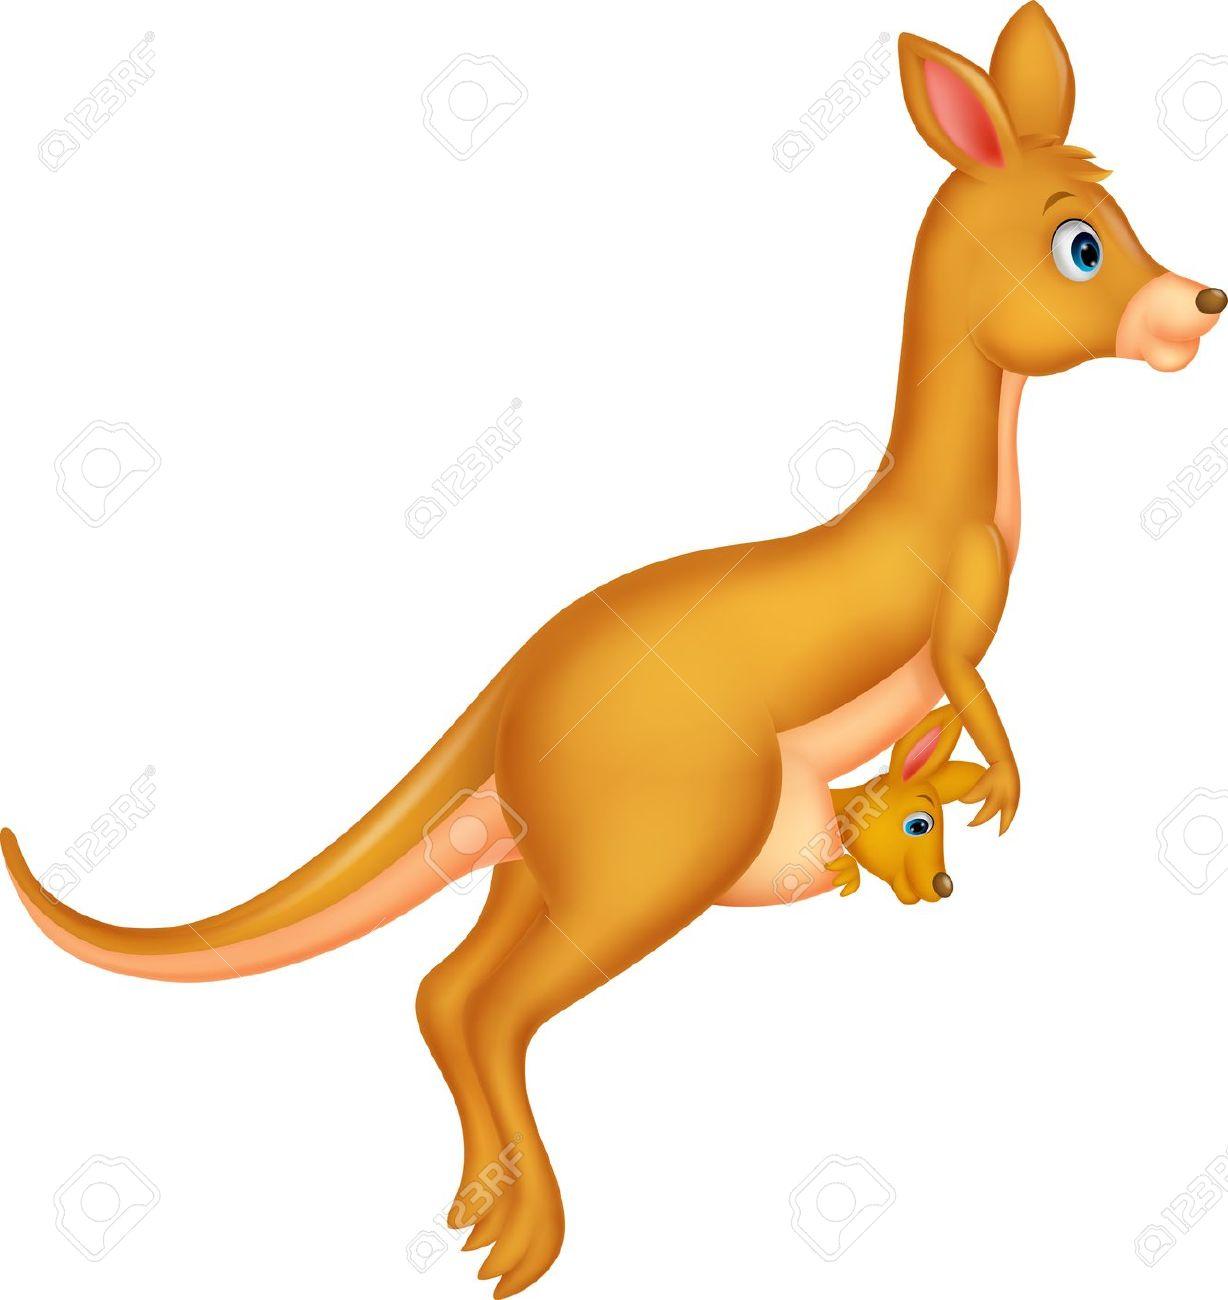 Mother And Baby Kangaroo .-Mother and baby kangaroo .-16